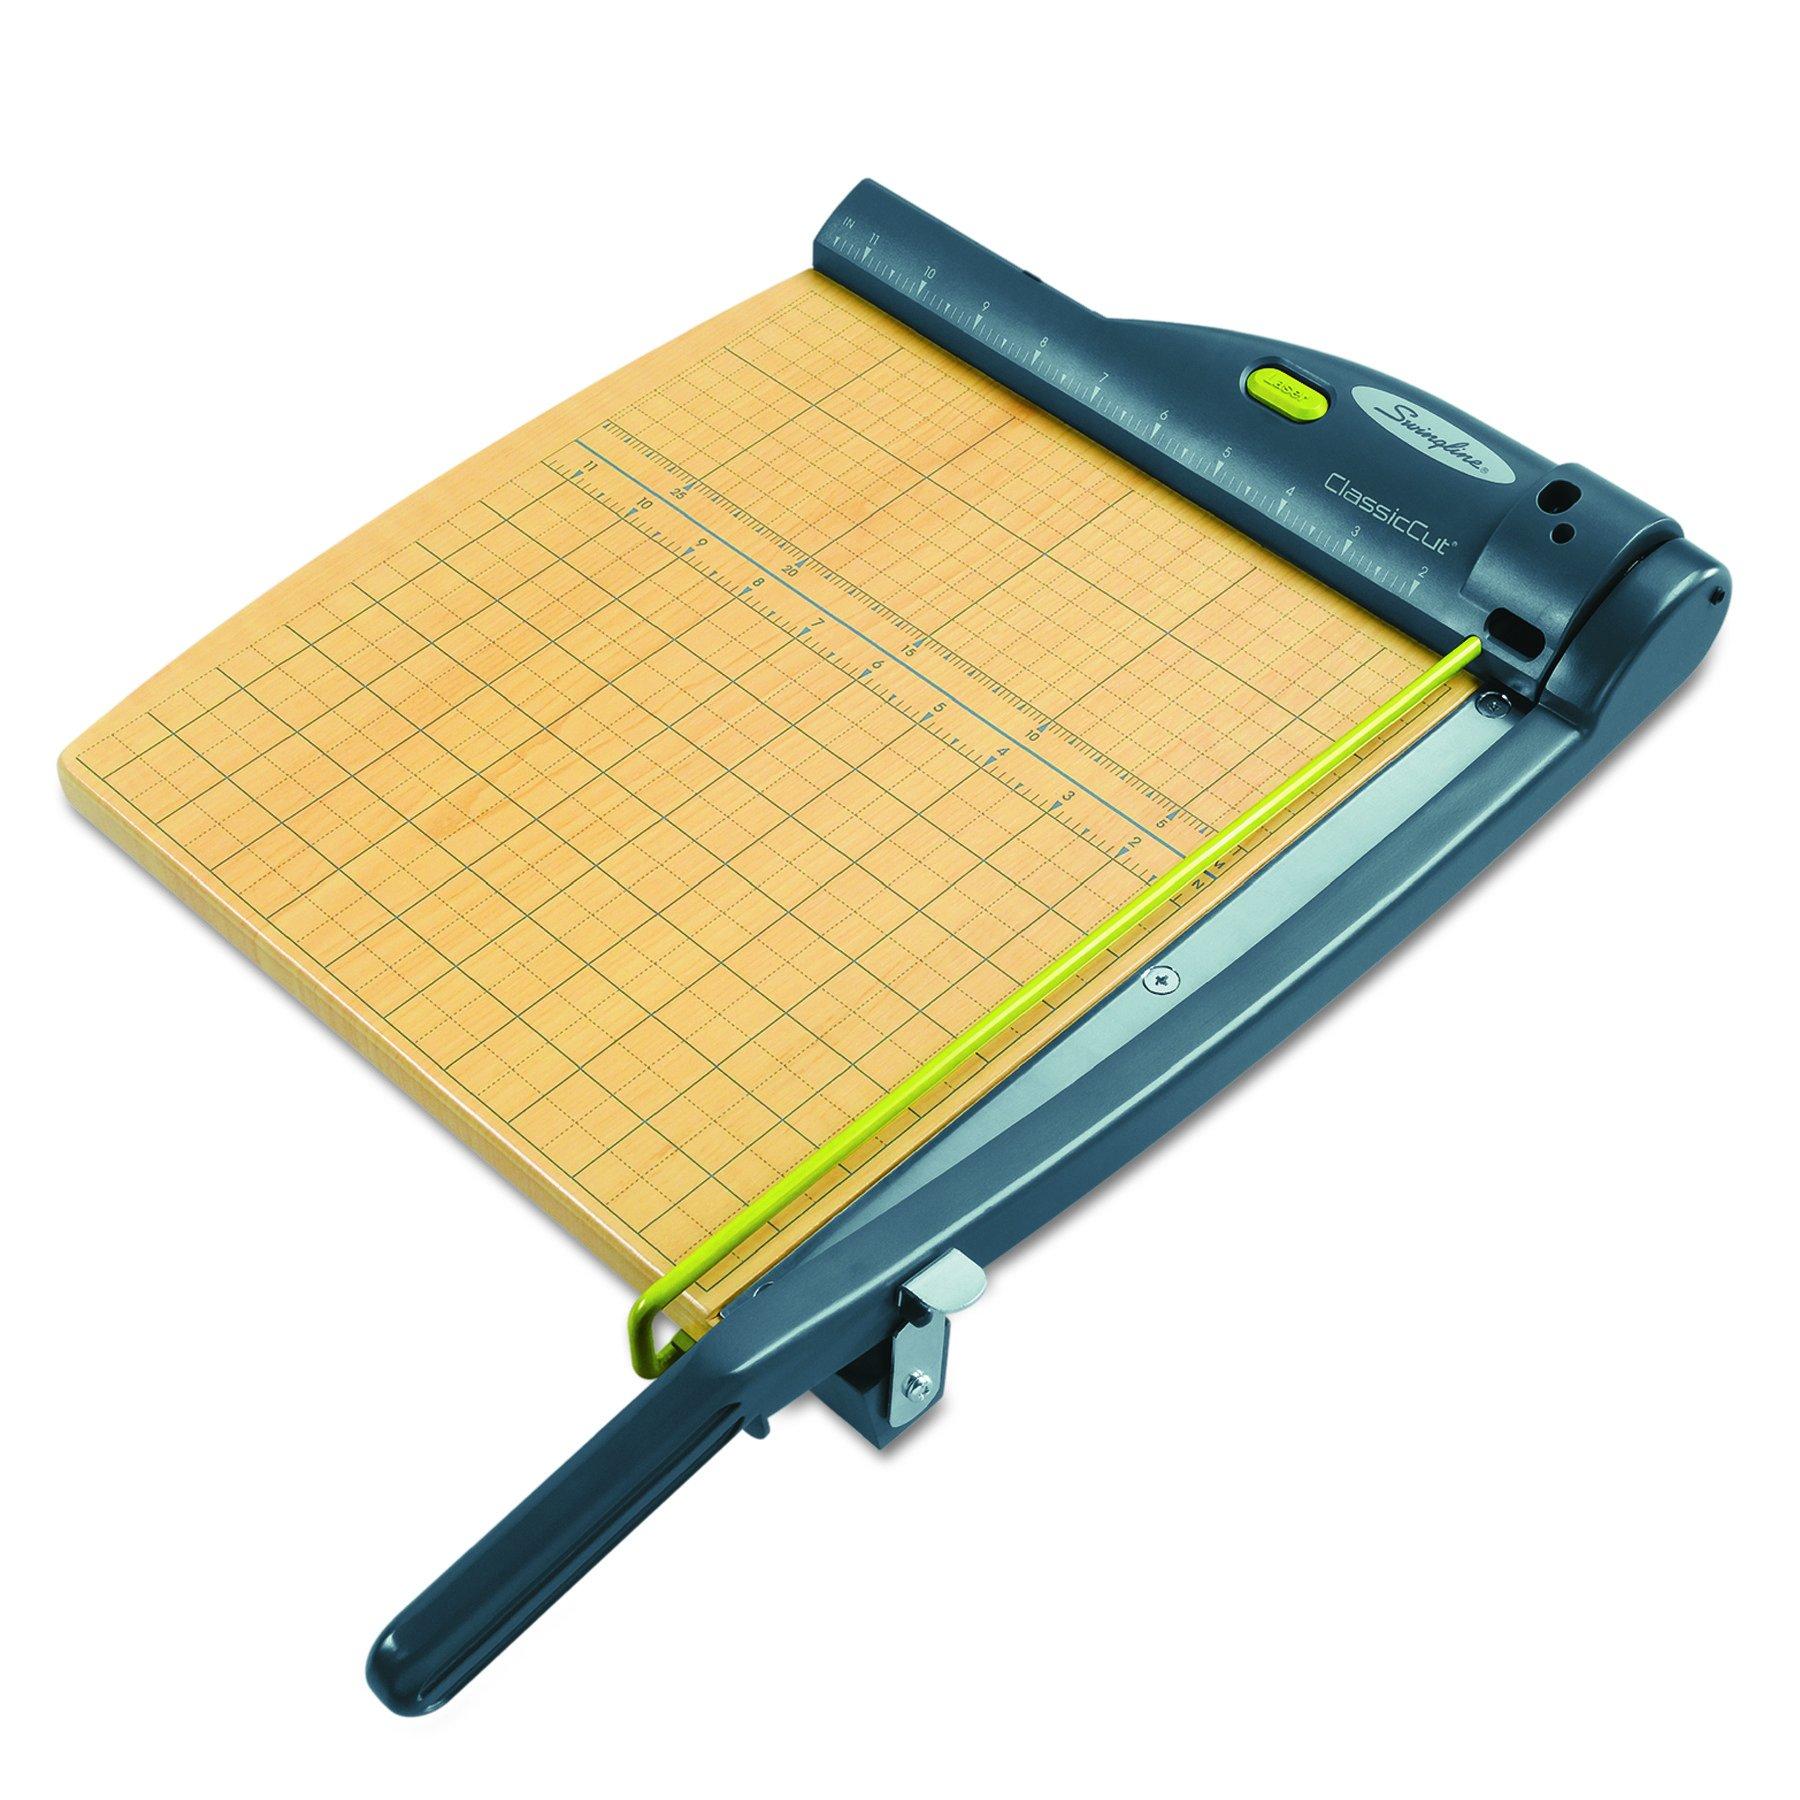 Swingline 9712 ClassicCut 15-Sheet Laser Trimmer, Metal/Wood Composite Base,12 x 12